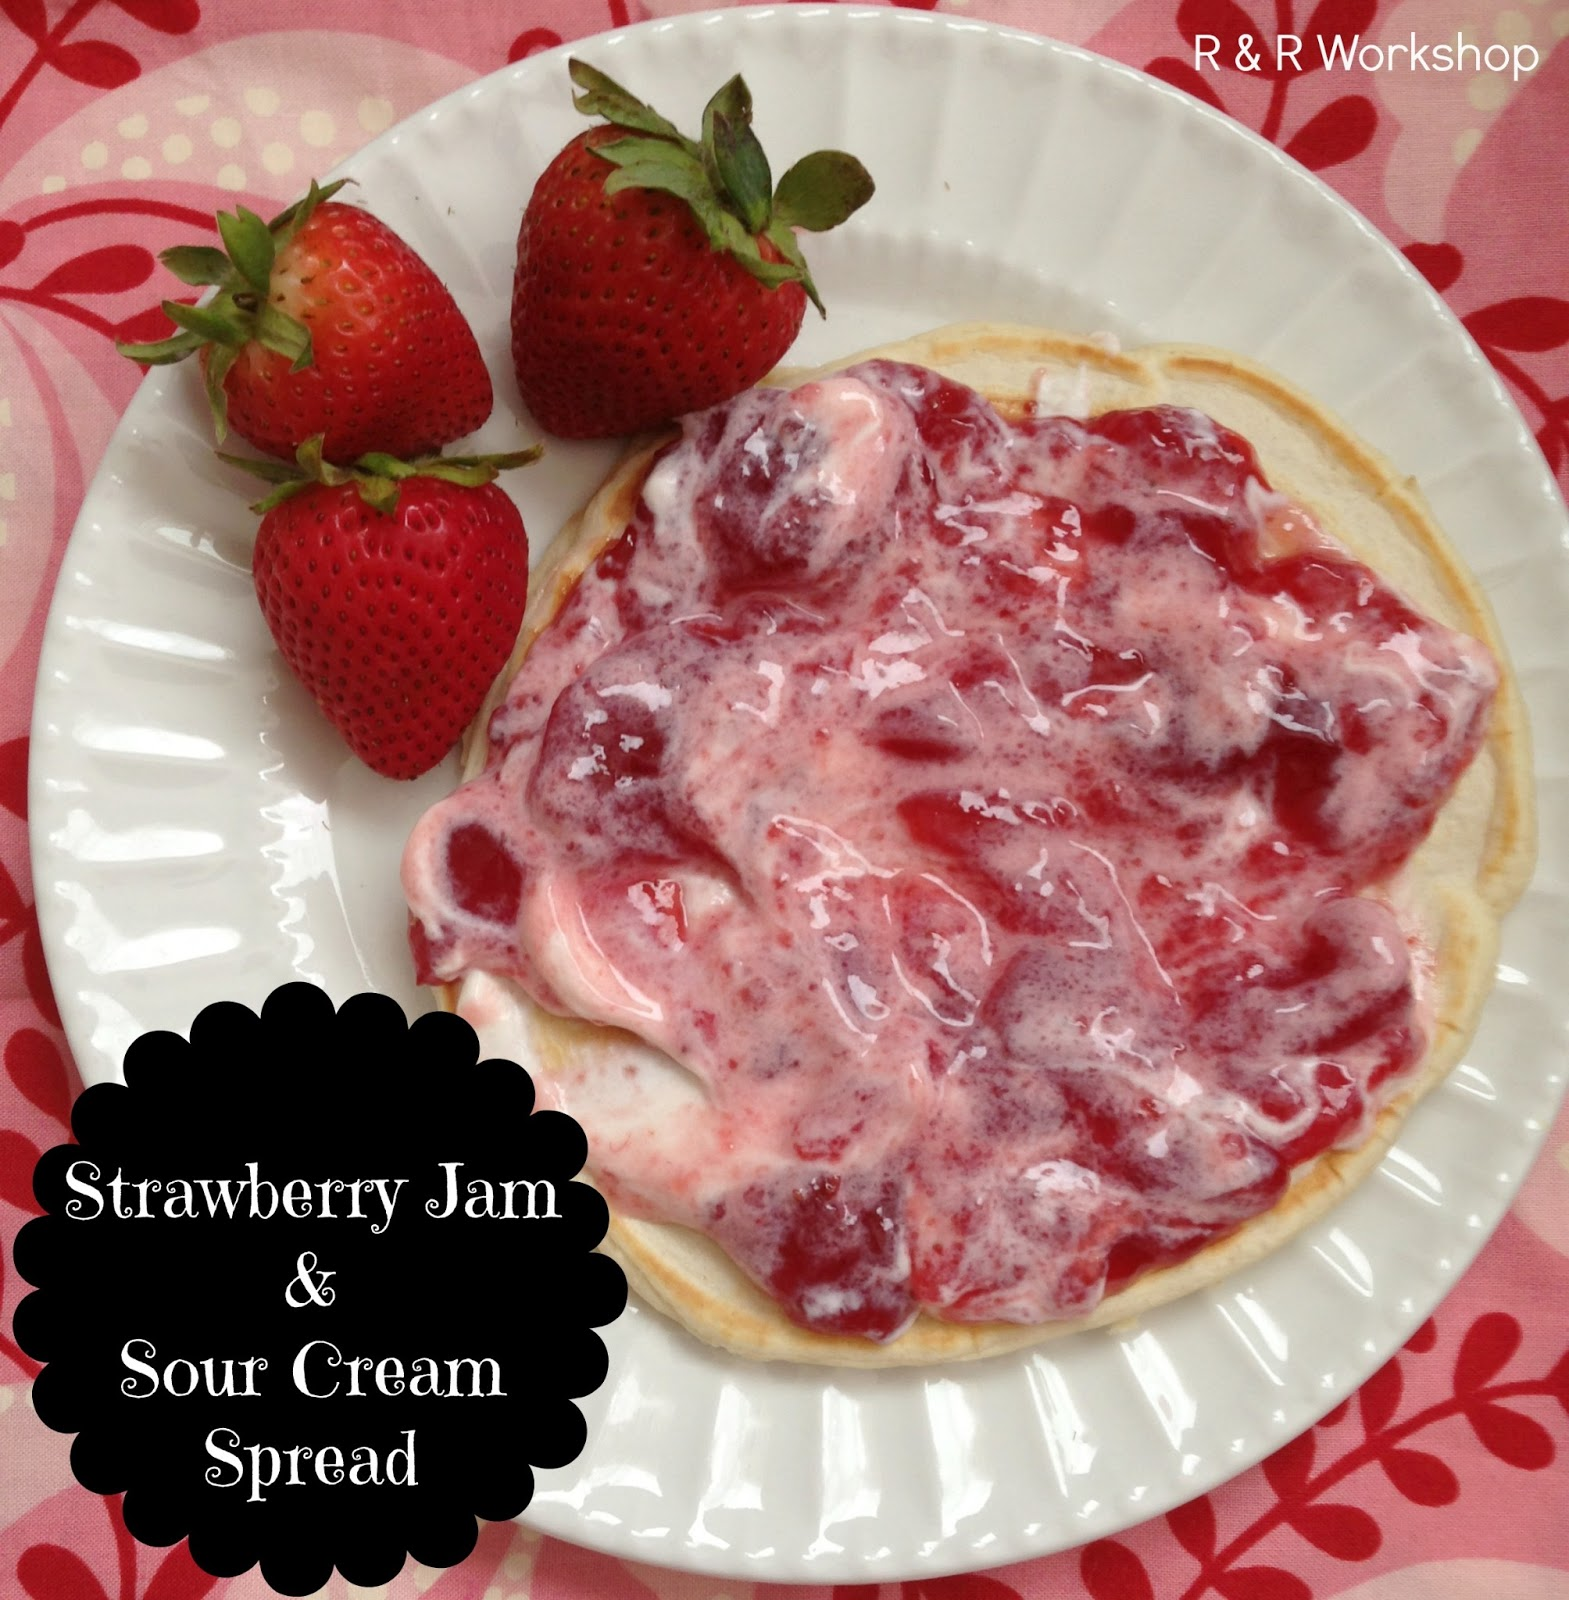 Strawberry Jam & Sour Cream Spread